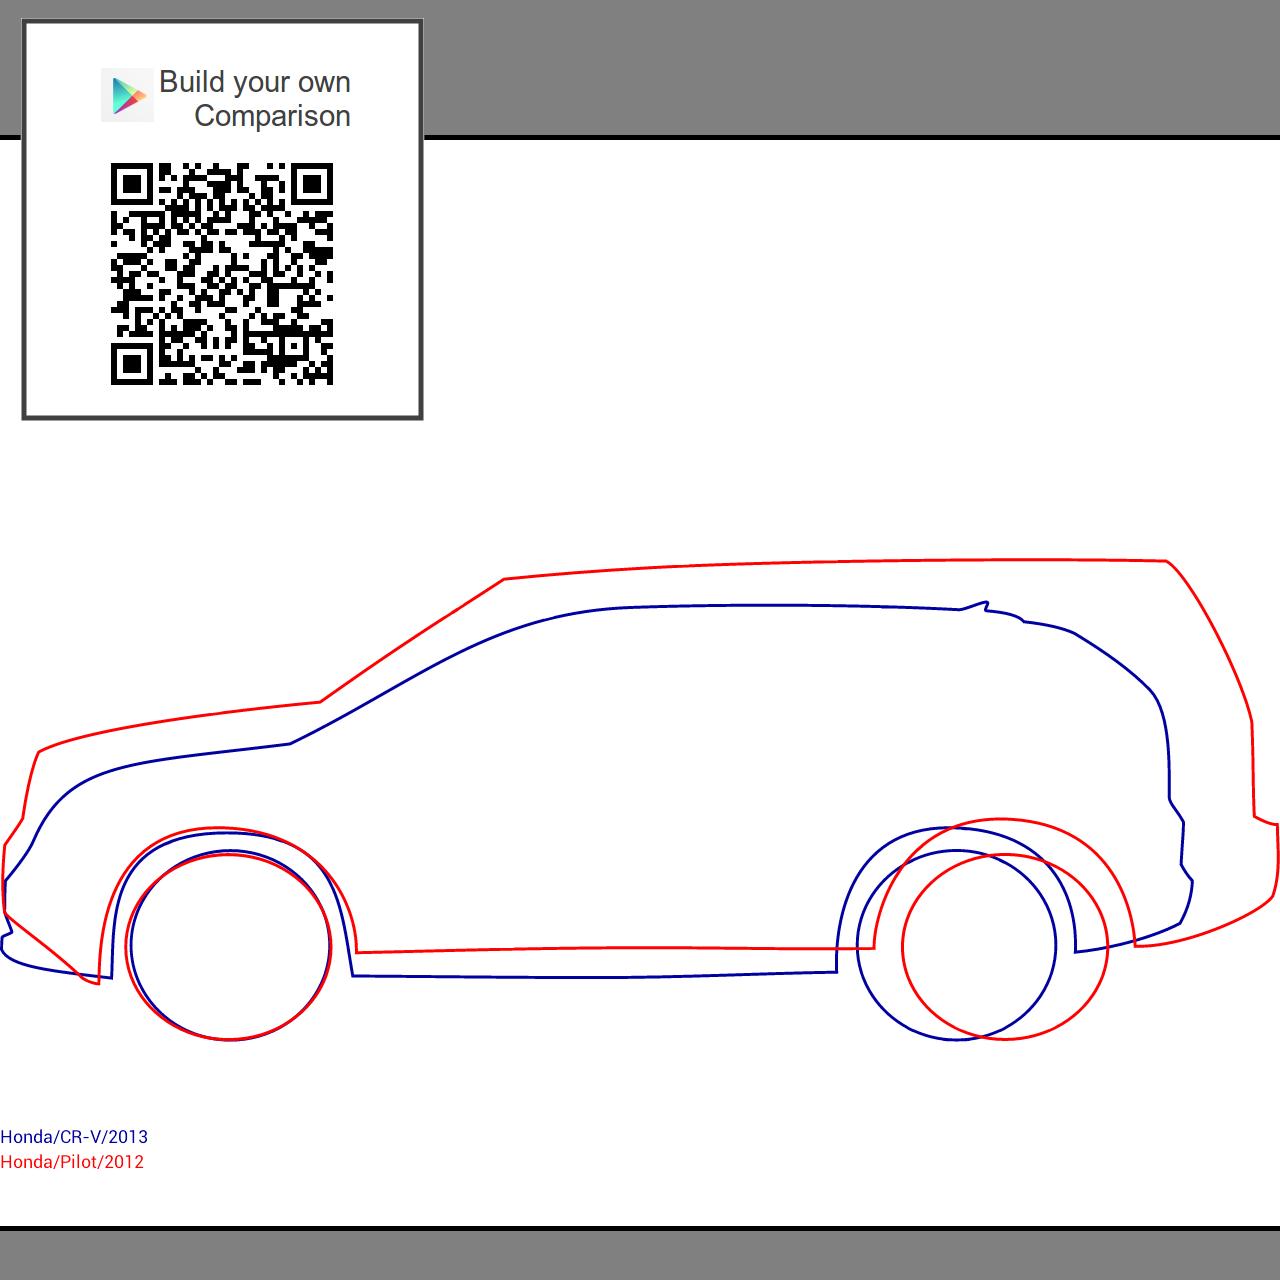 Honda CR-V 2013 vs Honda Pilot - Compare dimensions visually | www.car ...